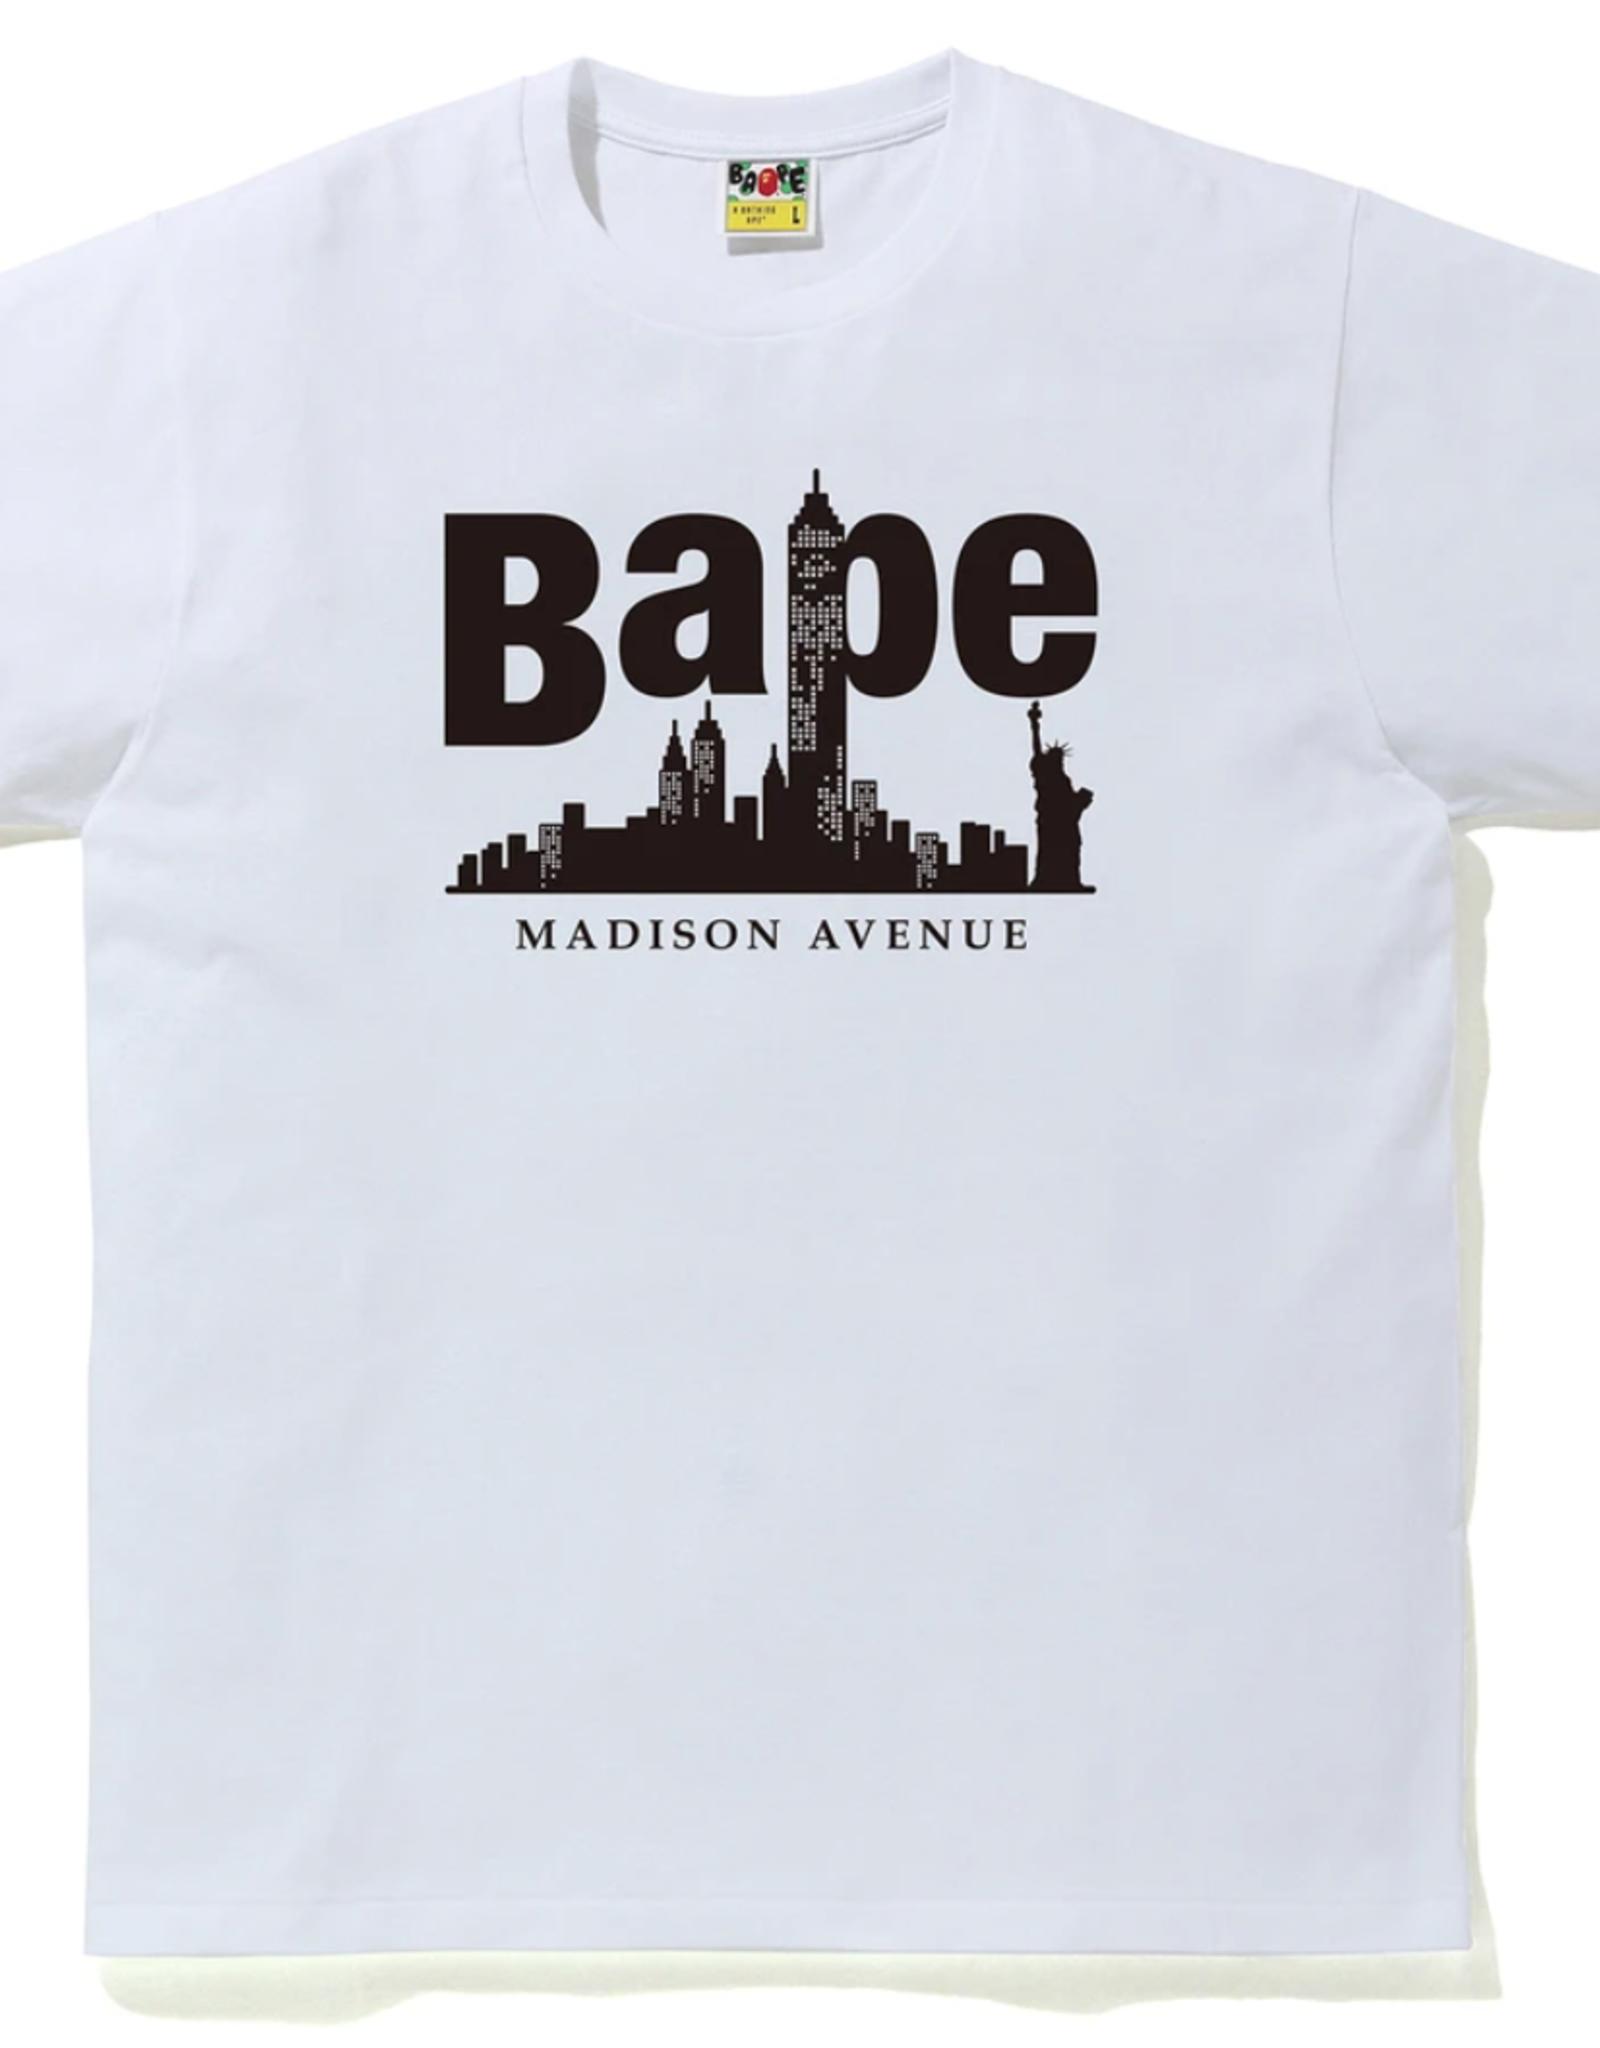 BAPE Bape Madison Avenue Tee 1 - XL